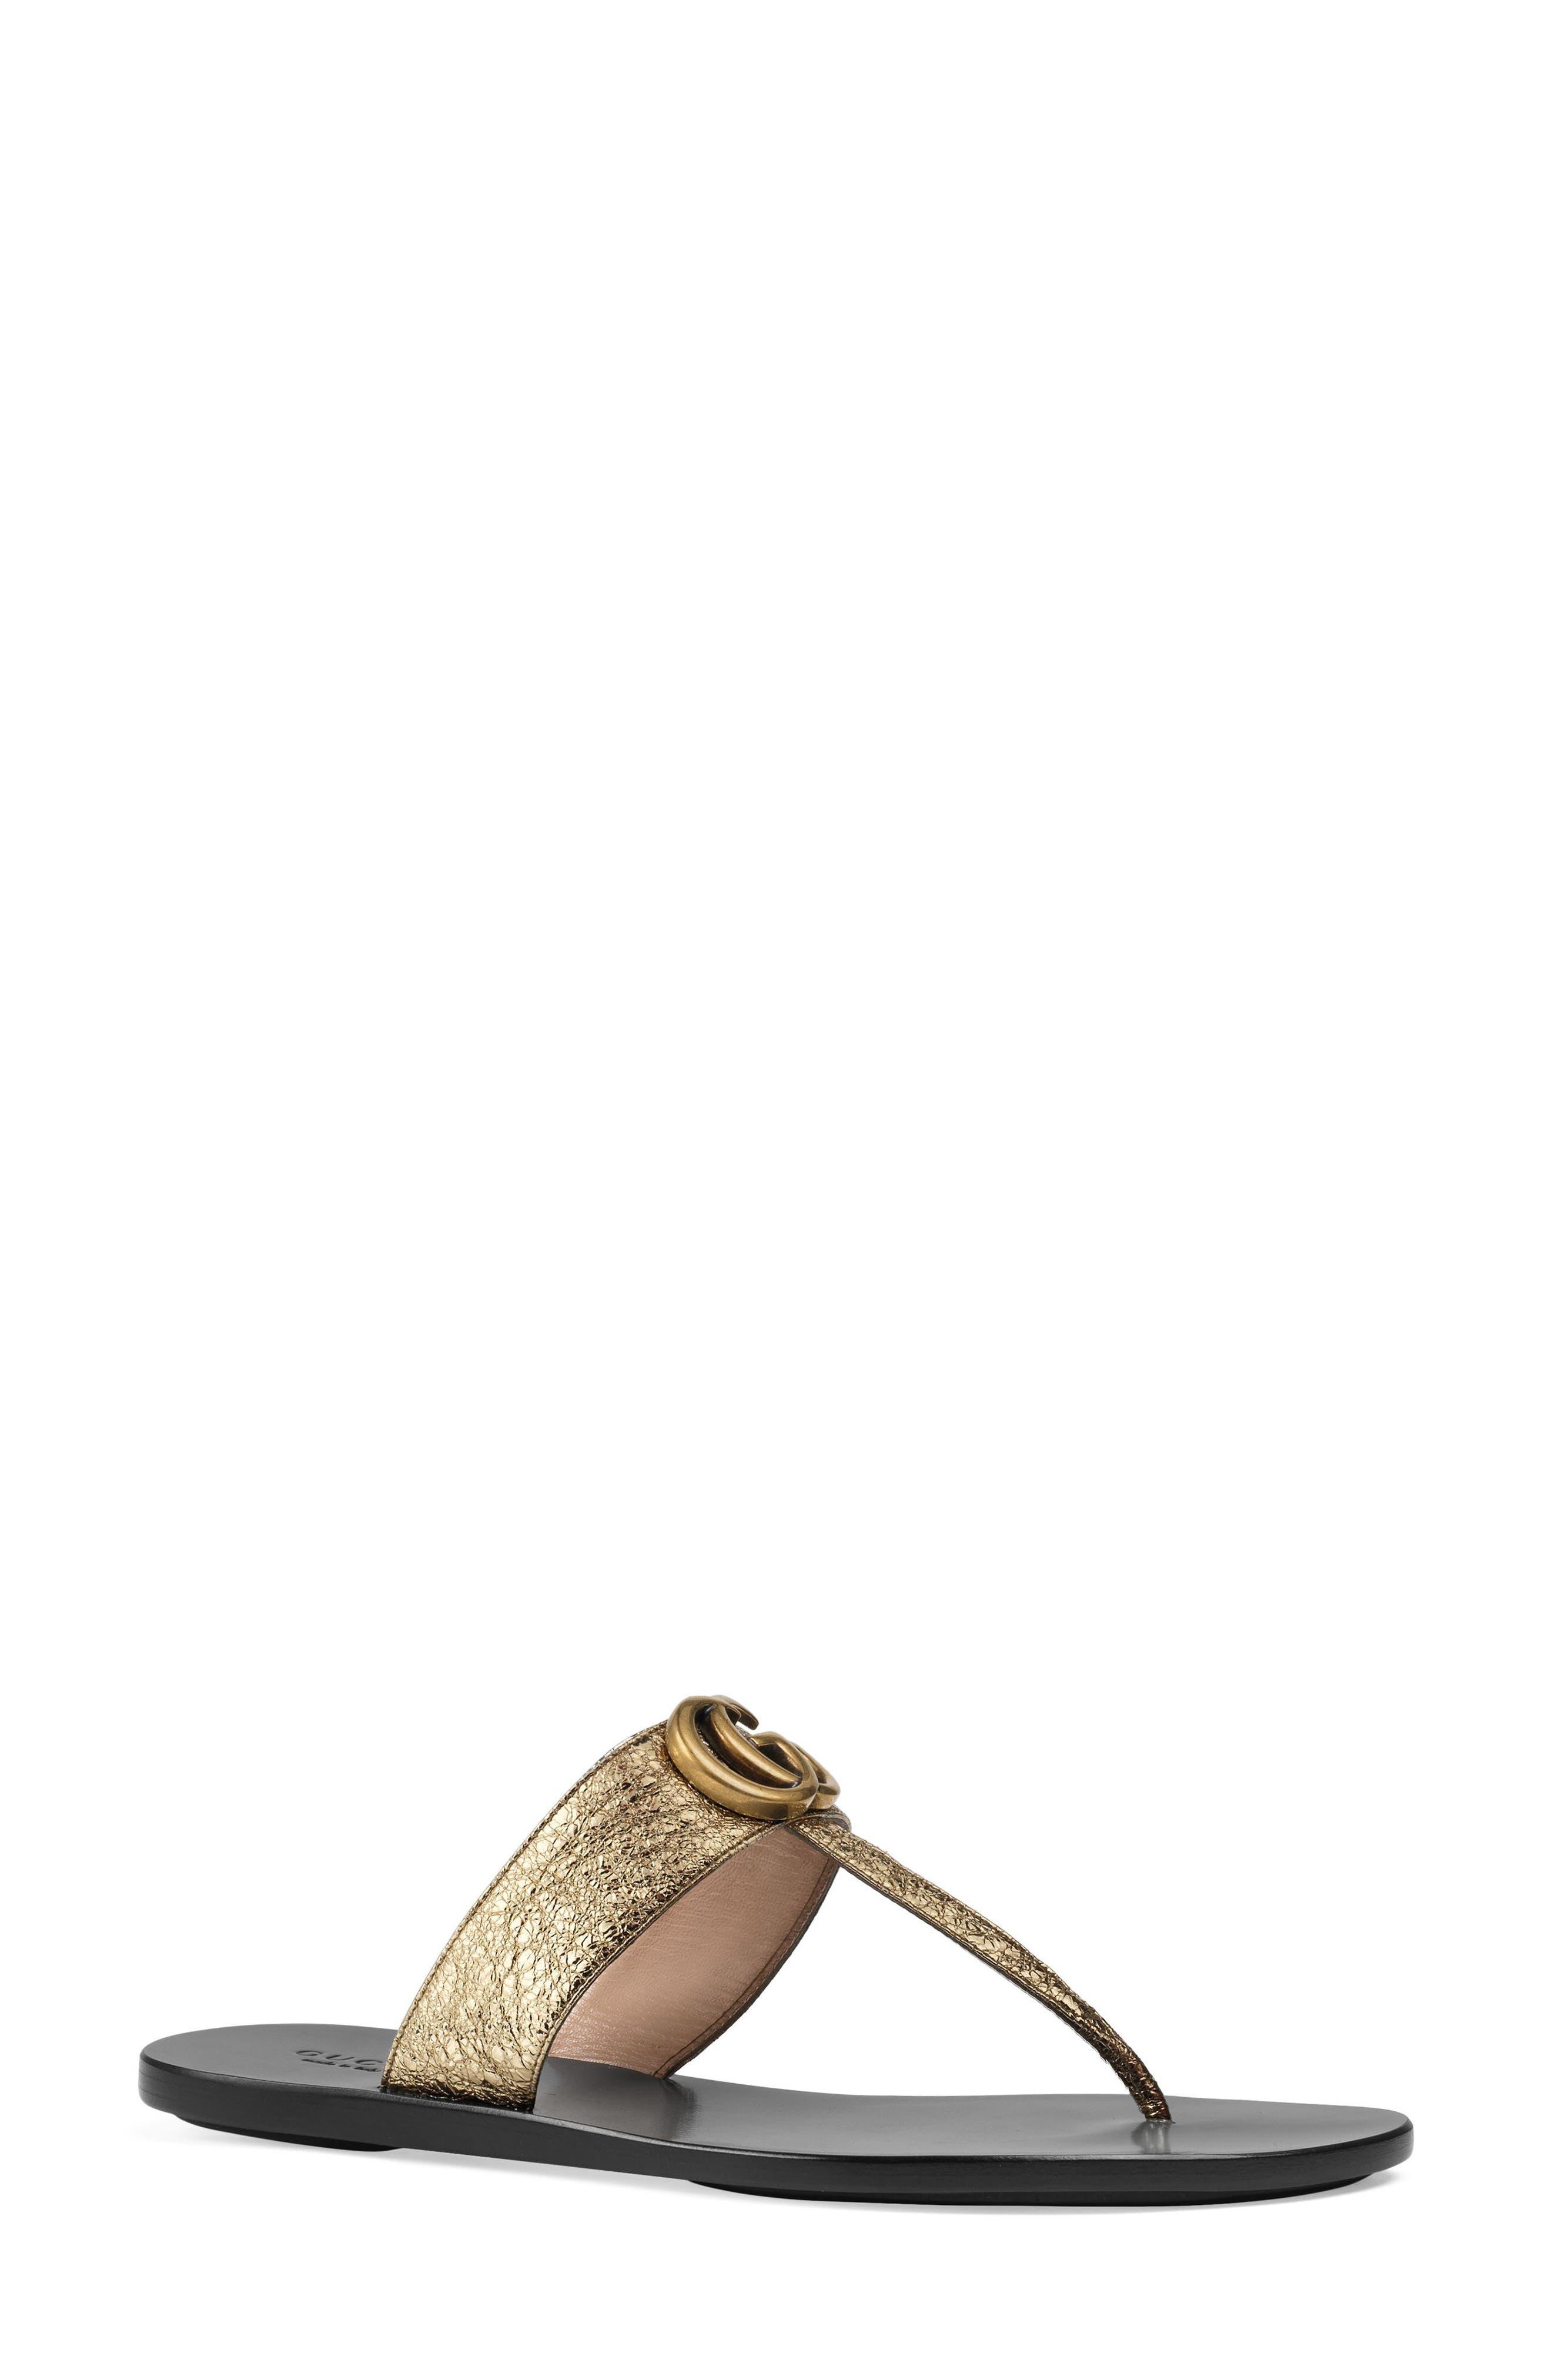 Main Image - Gucci Marmont T-Strap Sandal (Women)